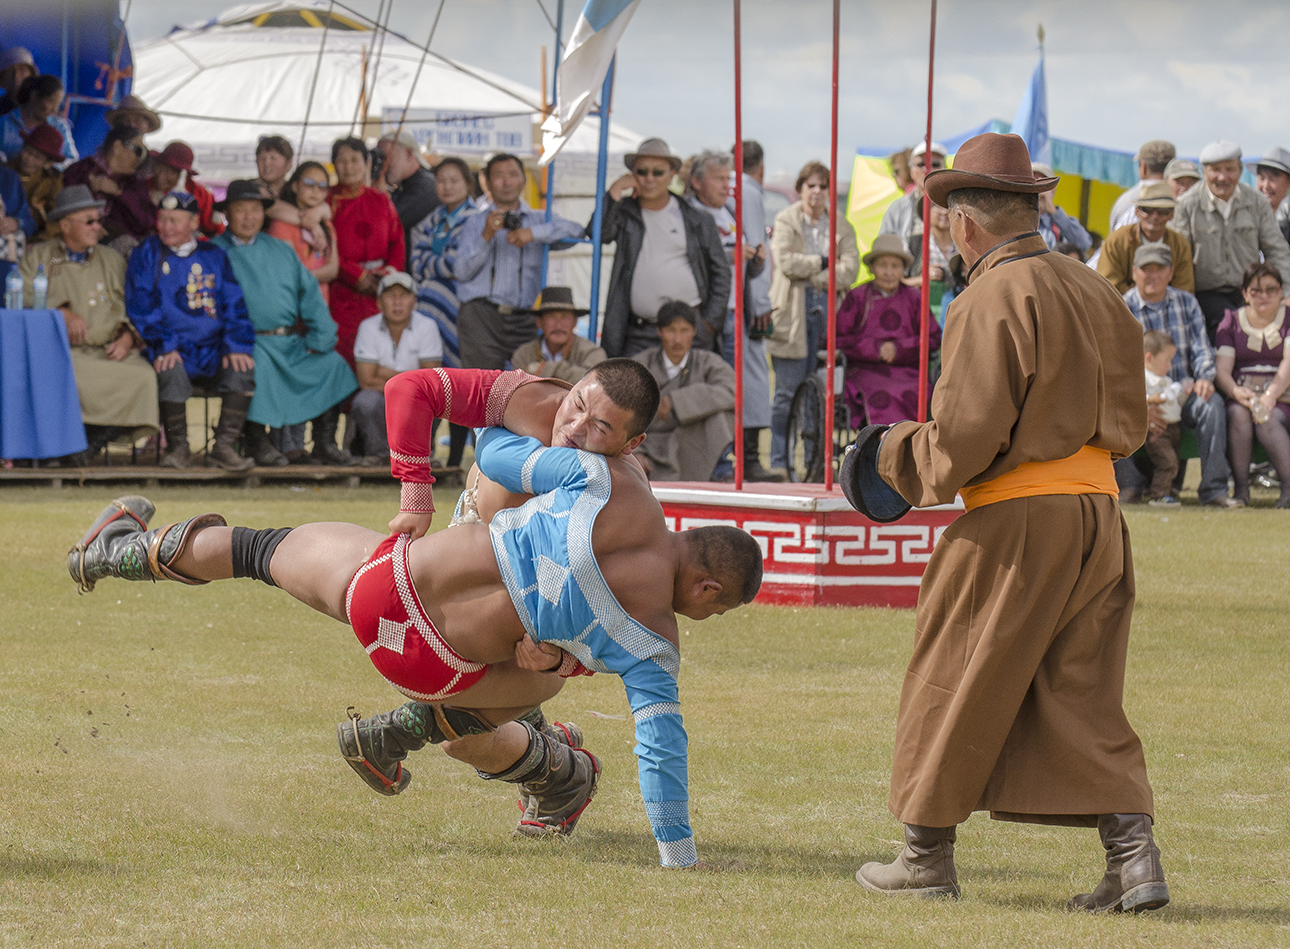 naadam wrestling photo in mongolia.jpg